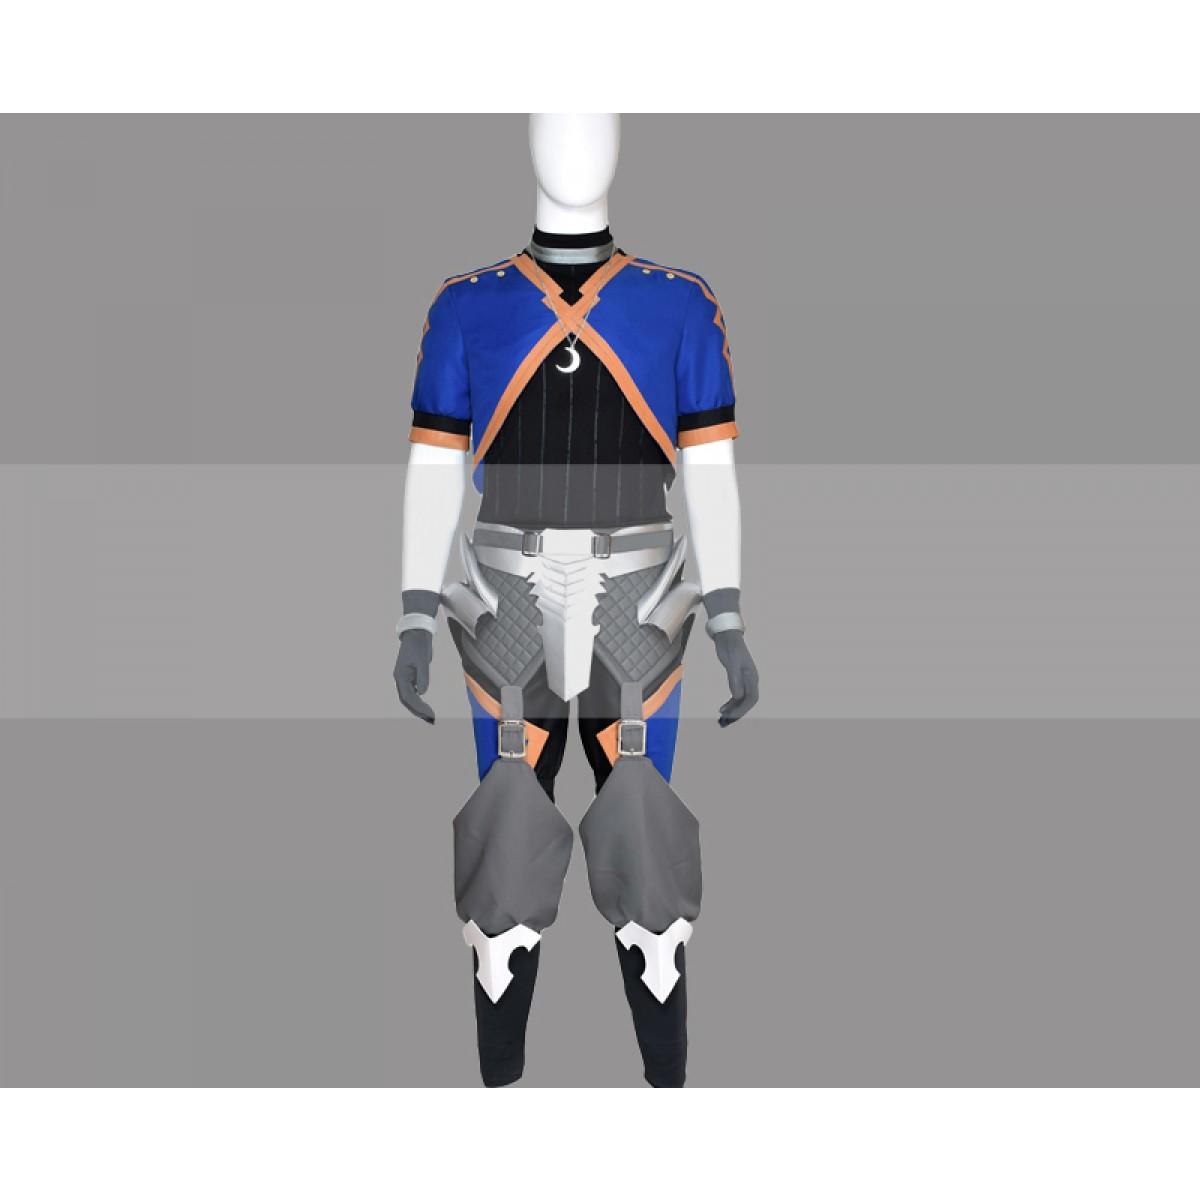 Fate/Grand Order Stage 1 Lancer Cu Chulainn Cosplay Costume